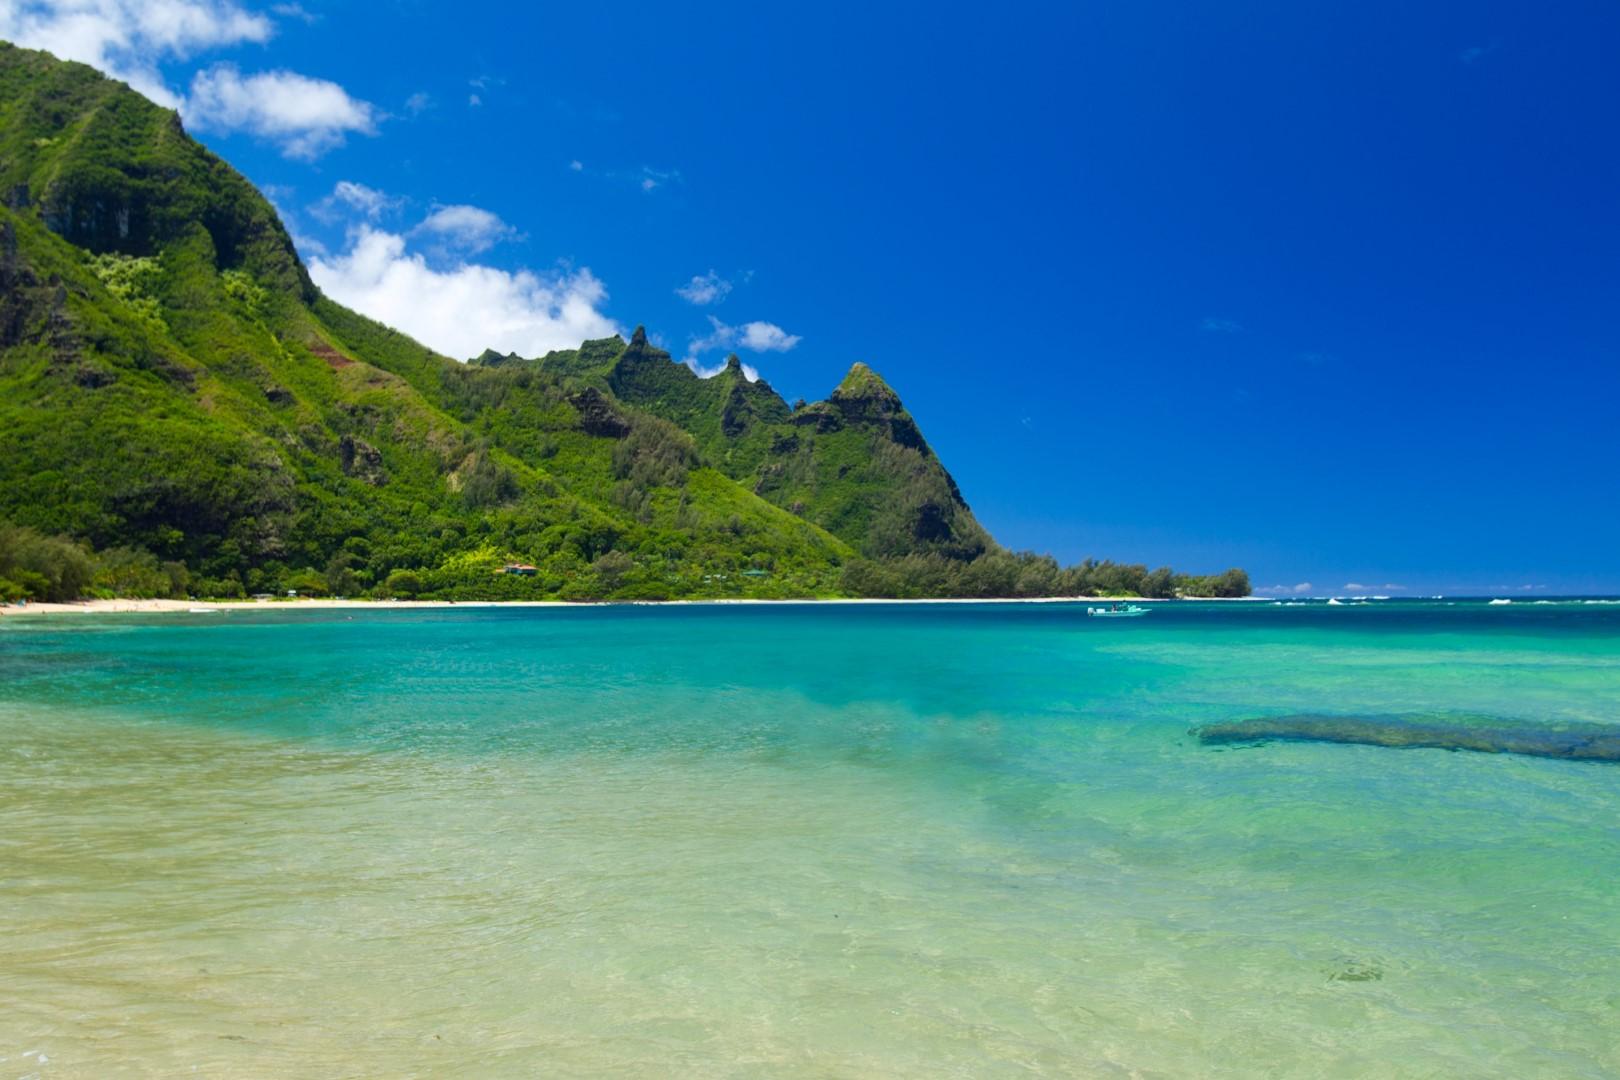 Hawaii, ecco le spiagge dell'eden americano